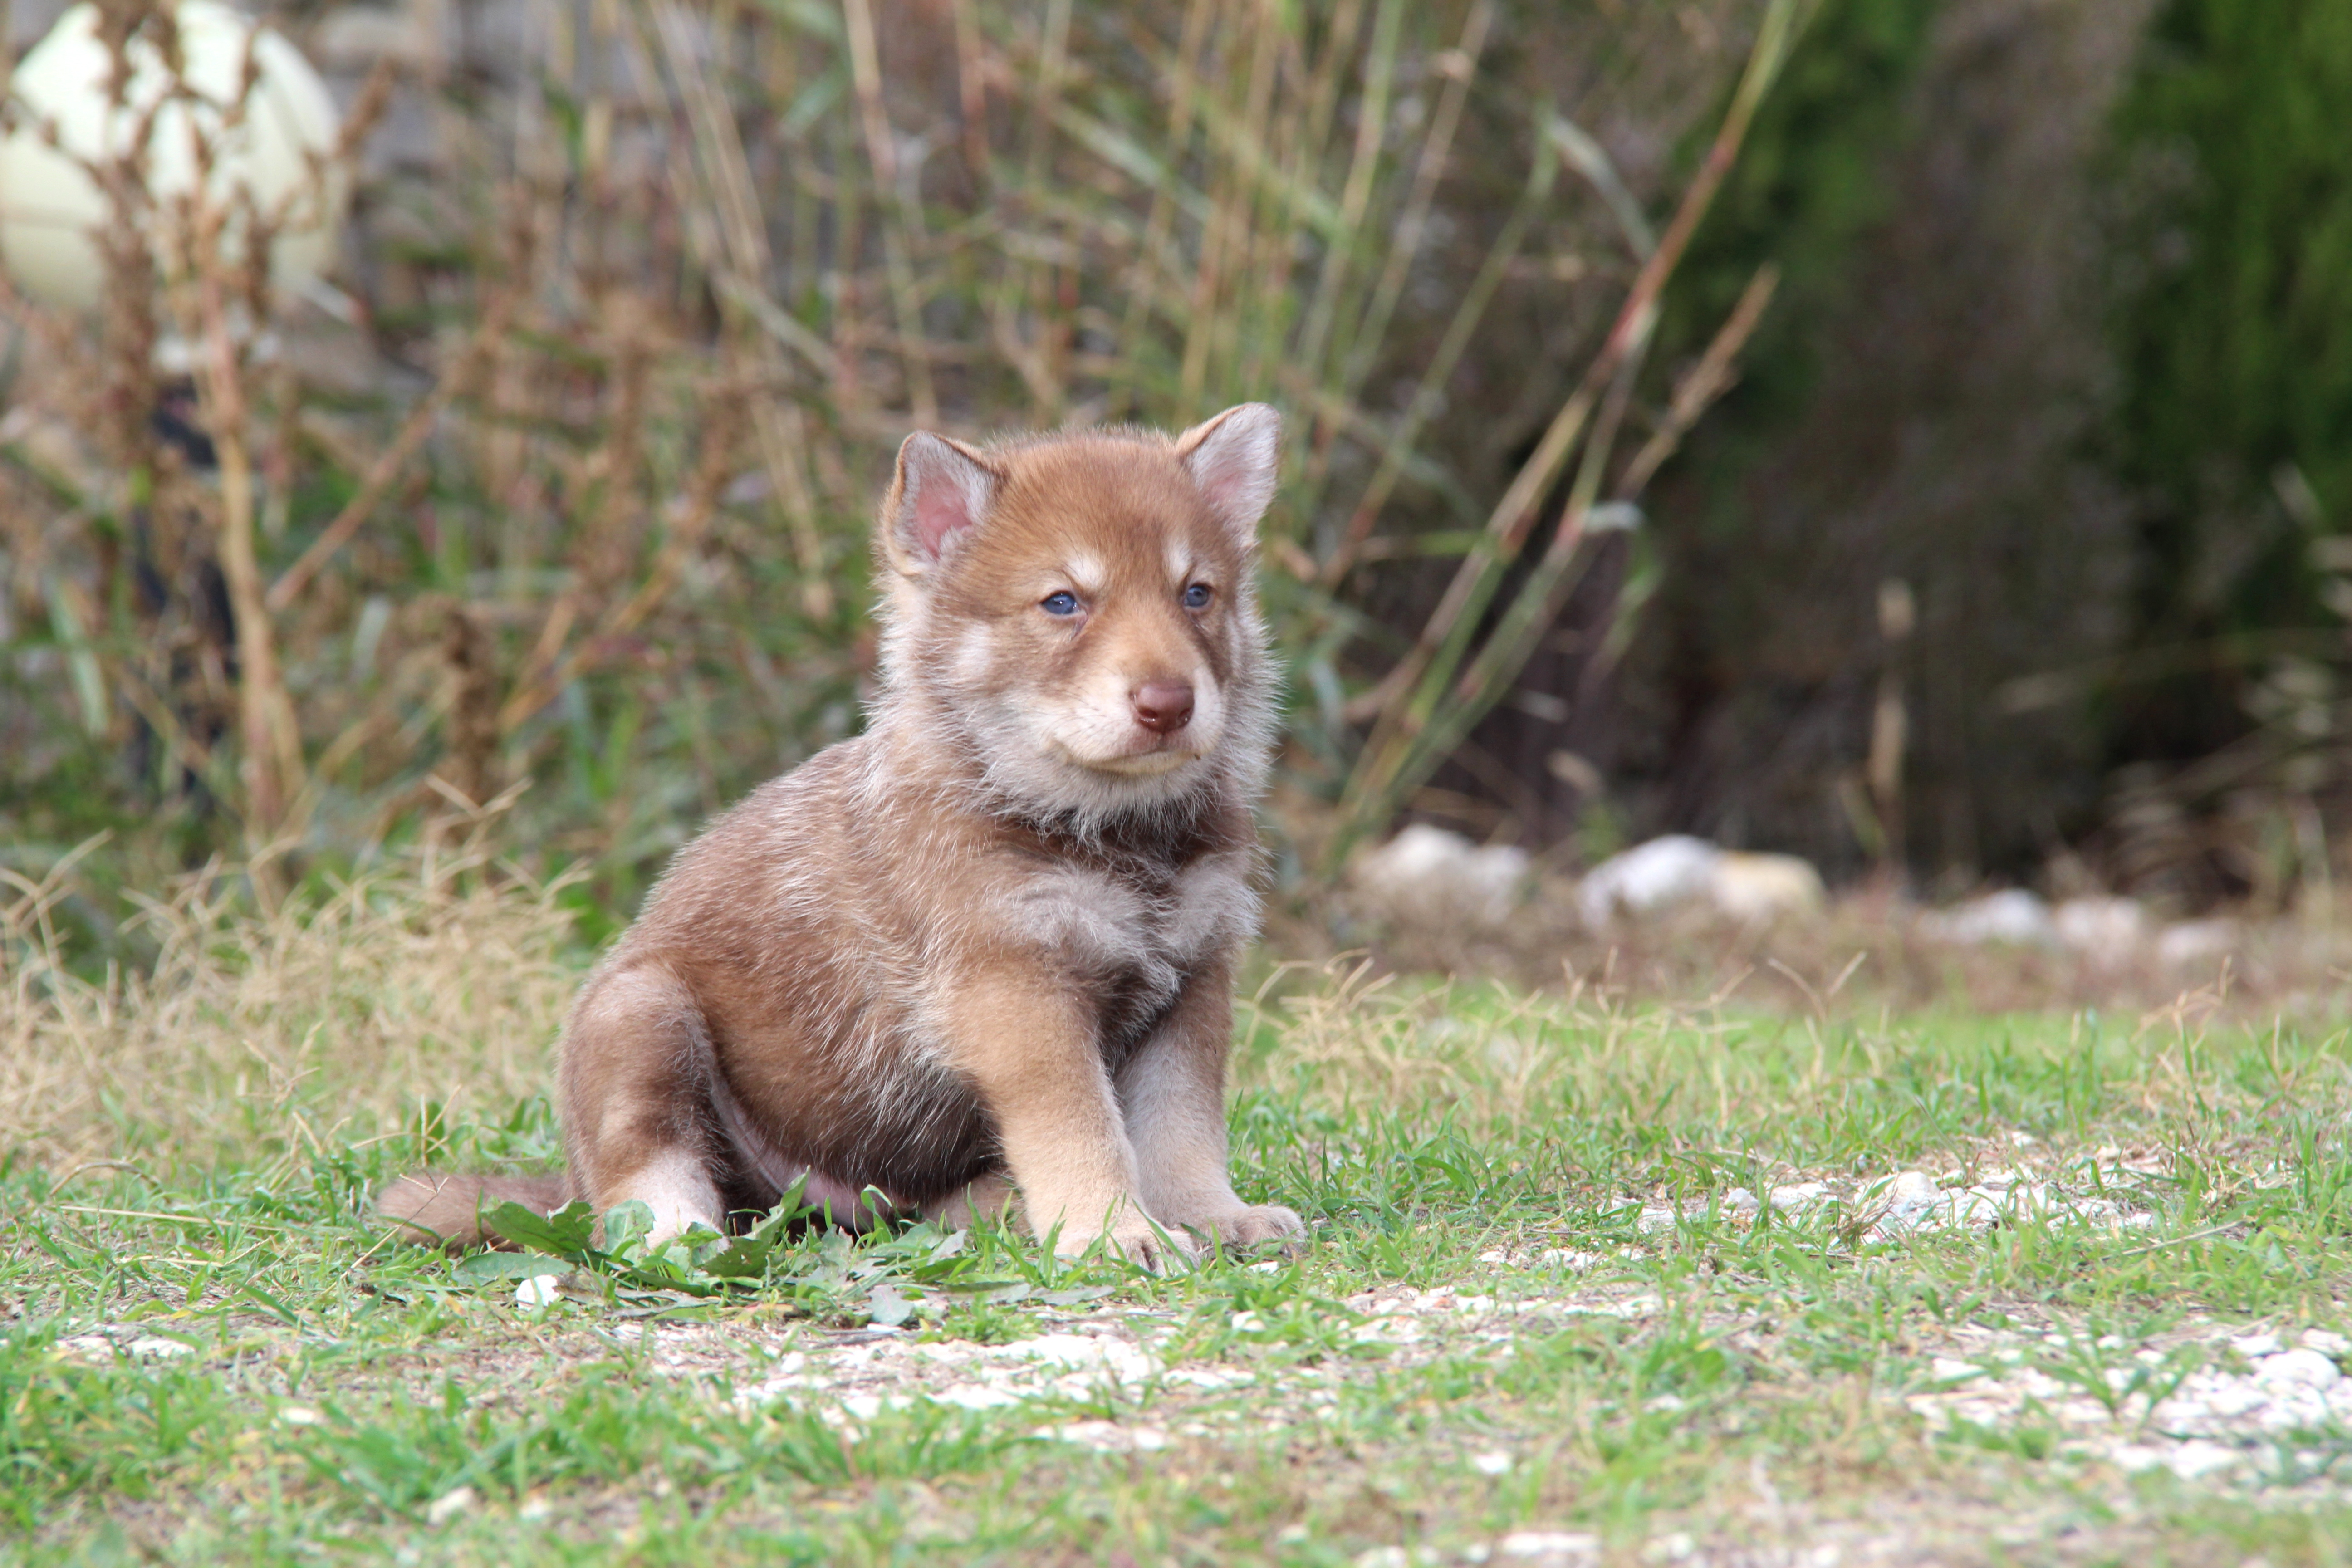 Saarlooswolfhond Puppies: Saarlooswolfhond Saarloos Wolfdog Puppies For Sale Breed